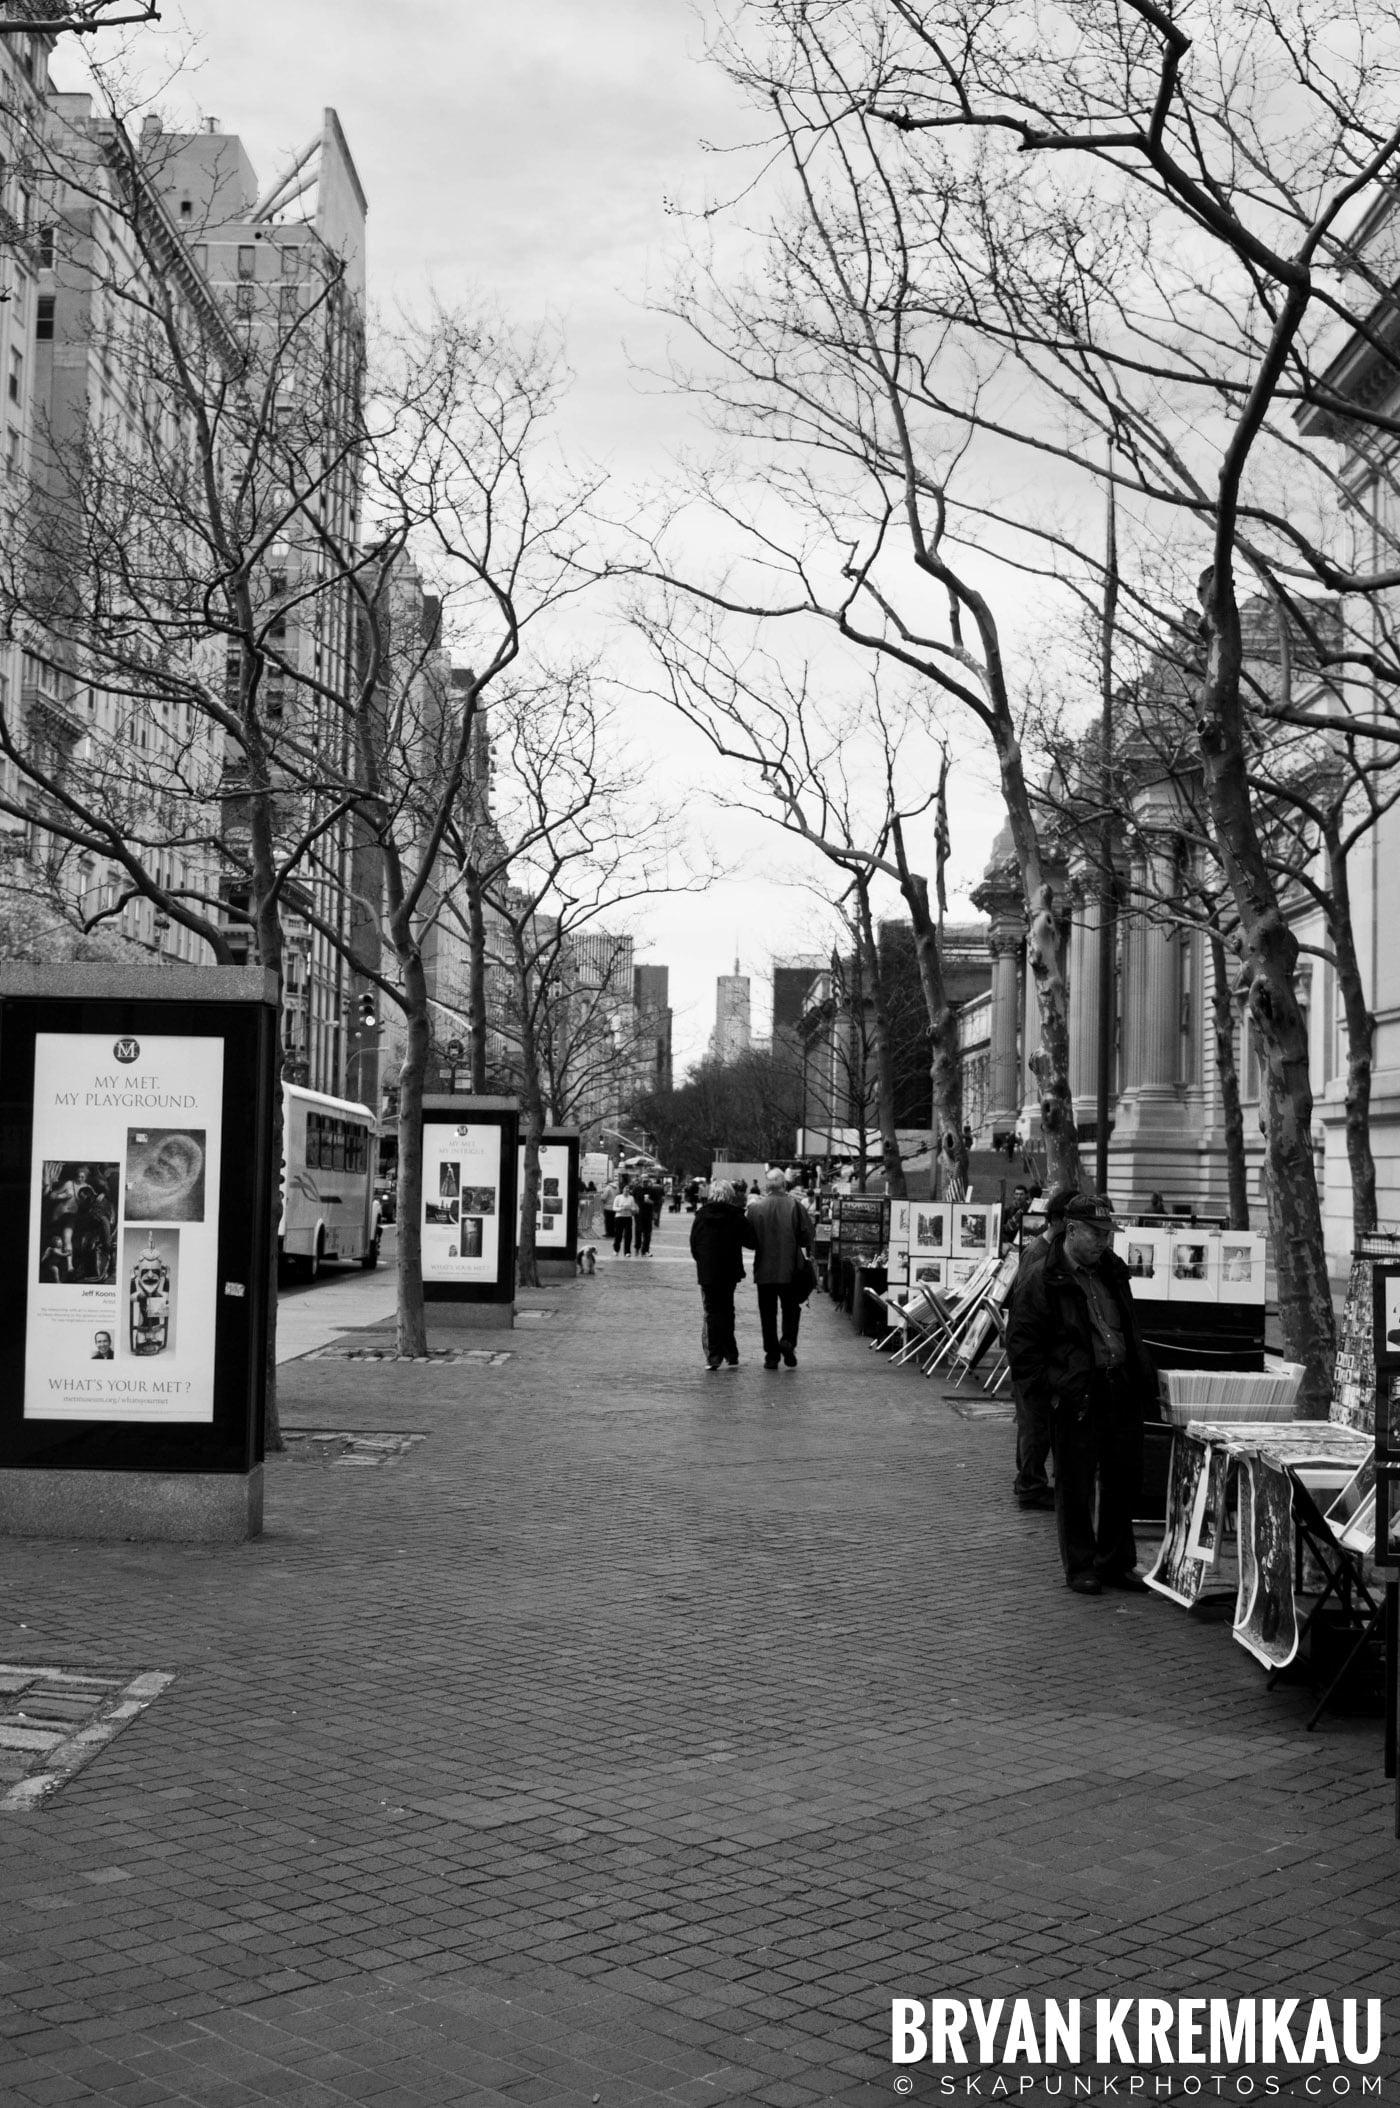 The Metropolitan Museum of Art and Shake Shack @ New York, NY - 3.24.12 (70)